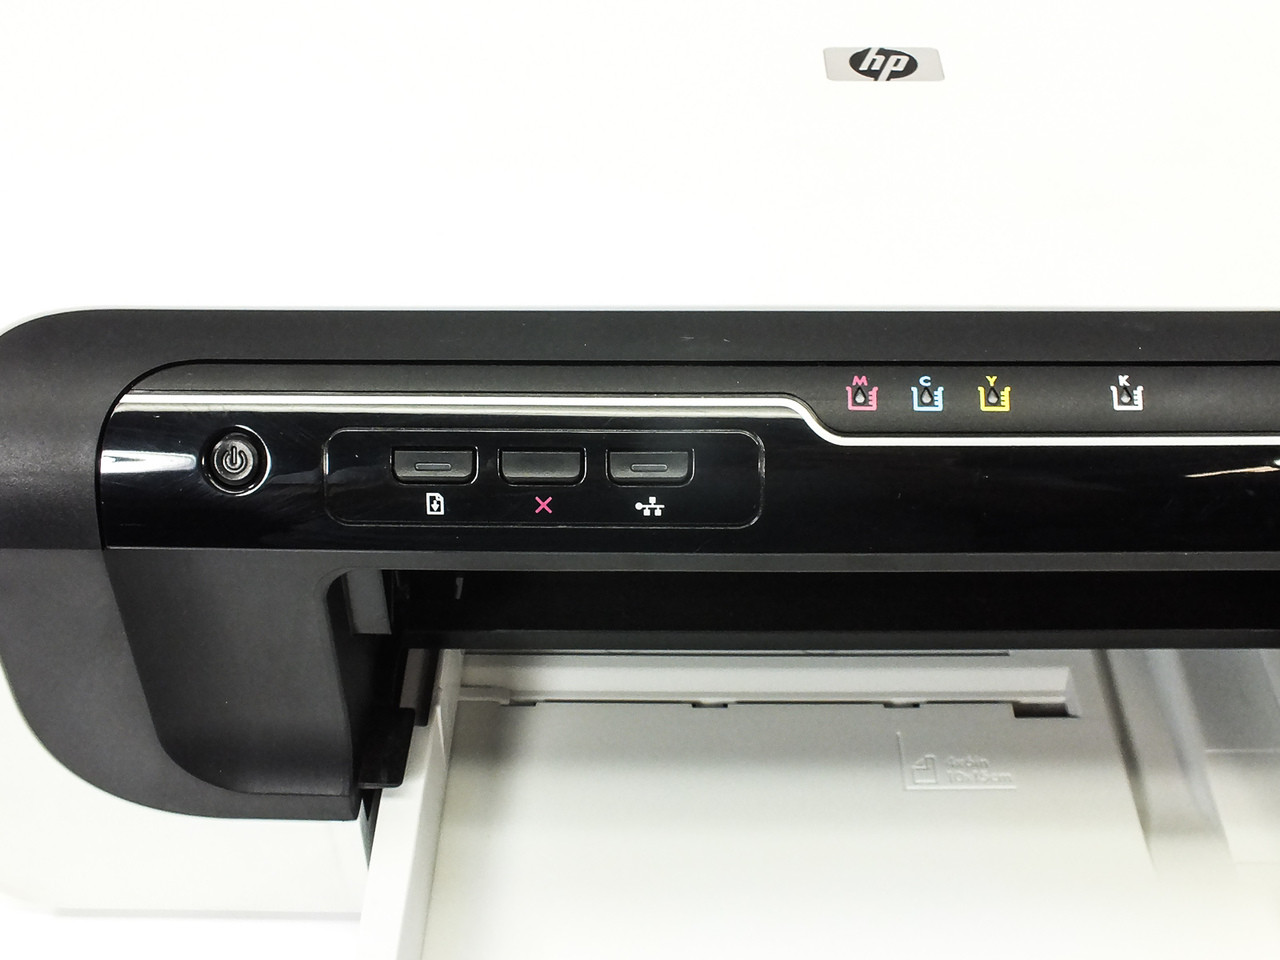 HP CB051-64001 OfficeJet 6000 Color Inject Printer 32PPM USB & Ethernet -  E609a